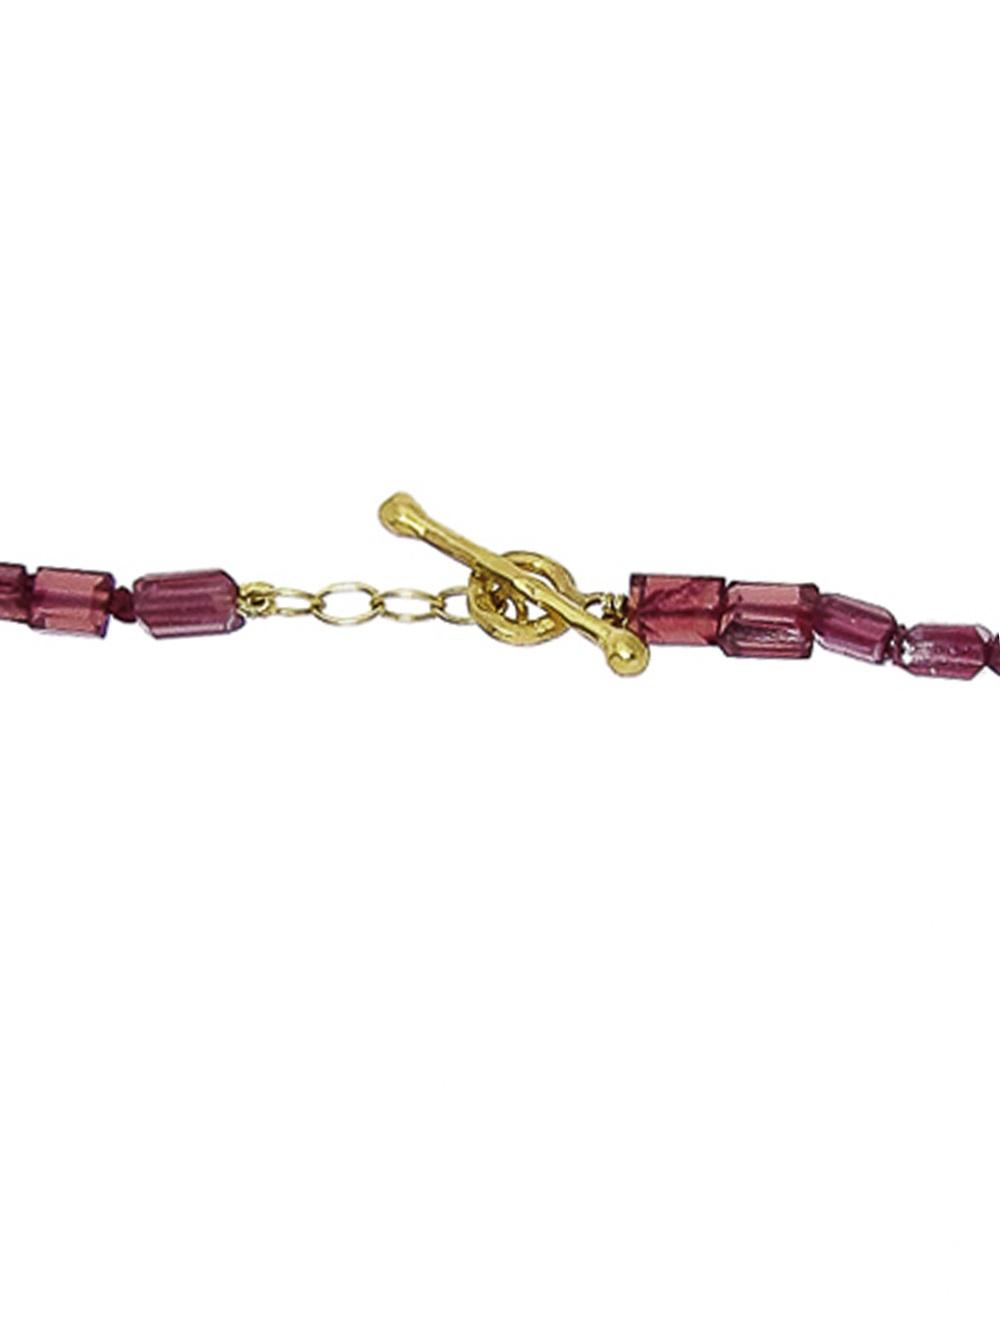 Cathy Waterman Rhodolite Bead Chain in Red